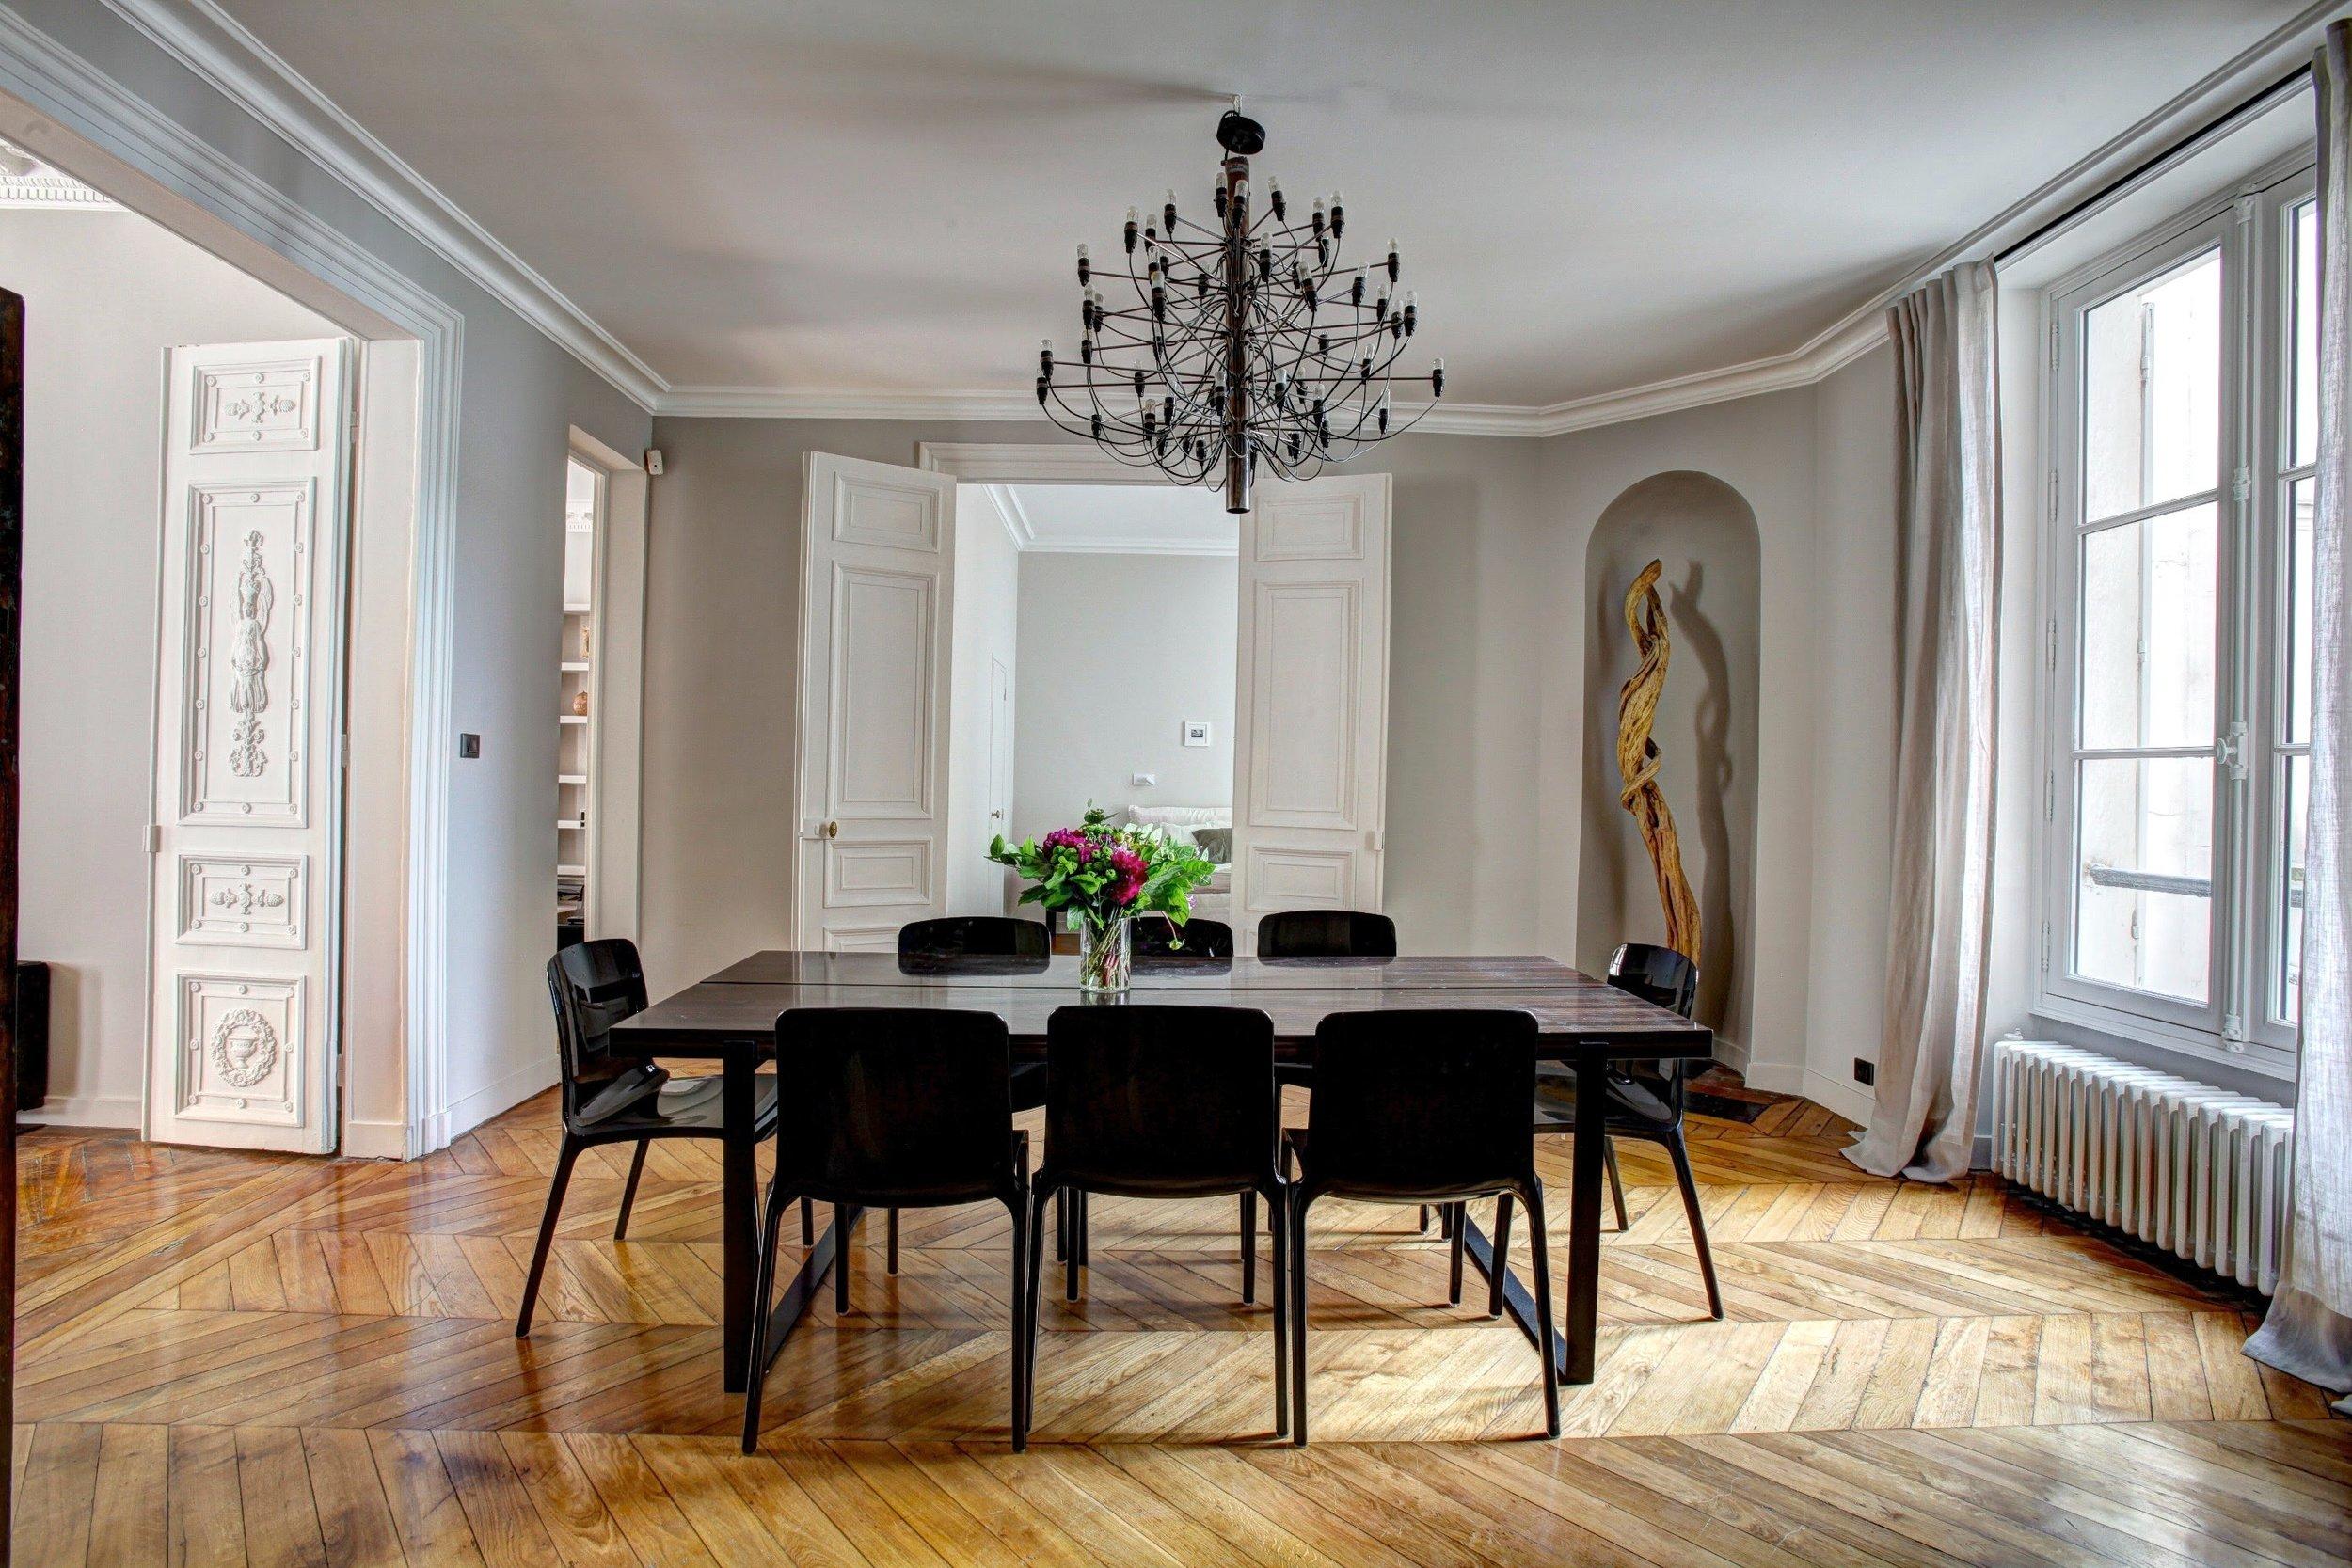 Dining Room with Sculpture in Corner.jpg